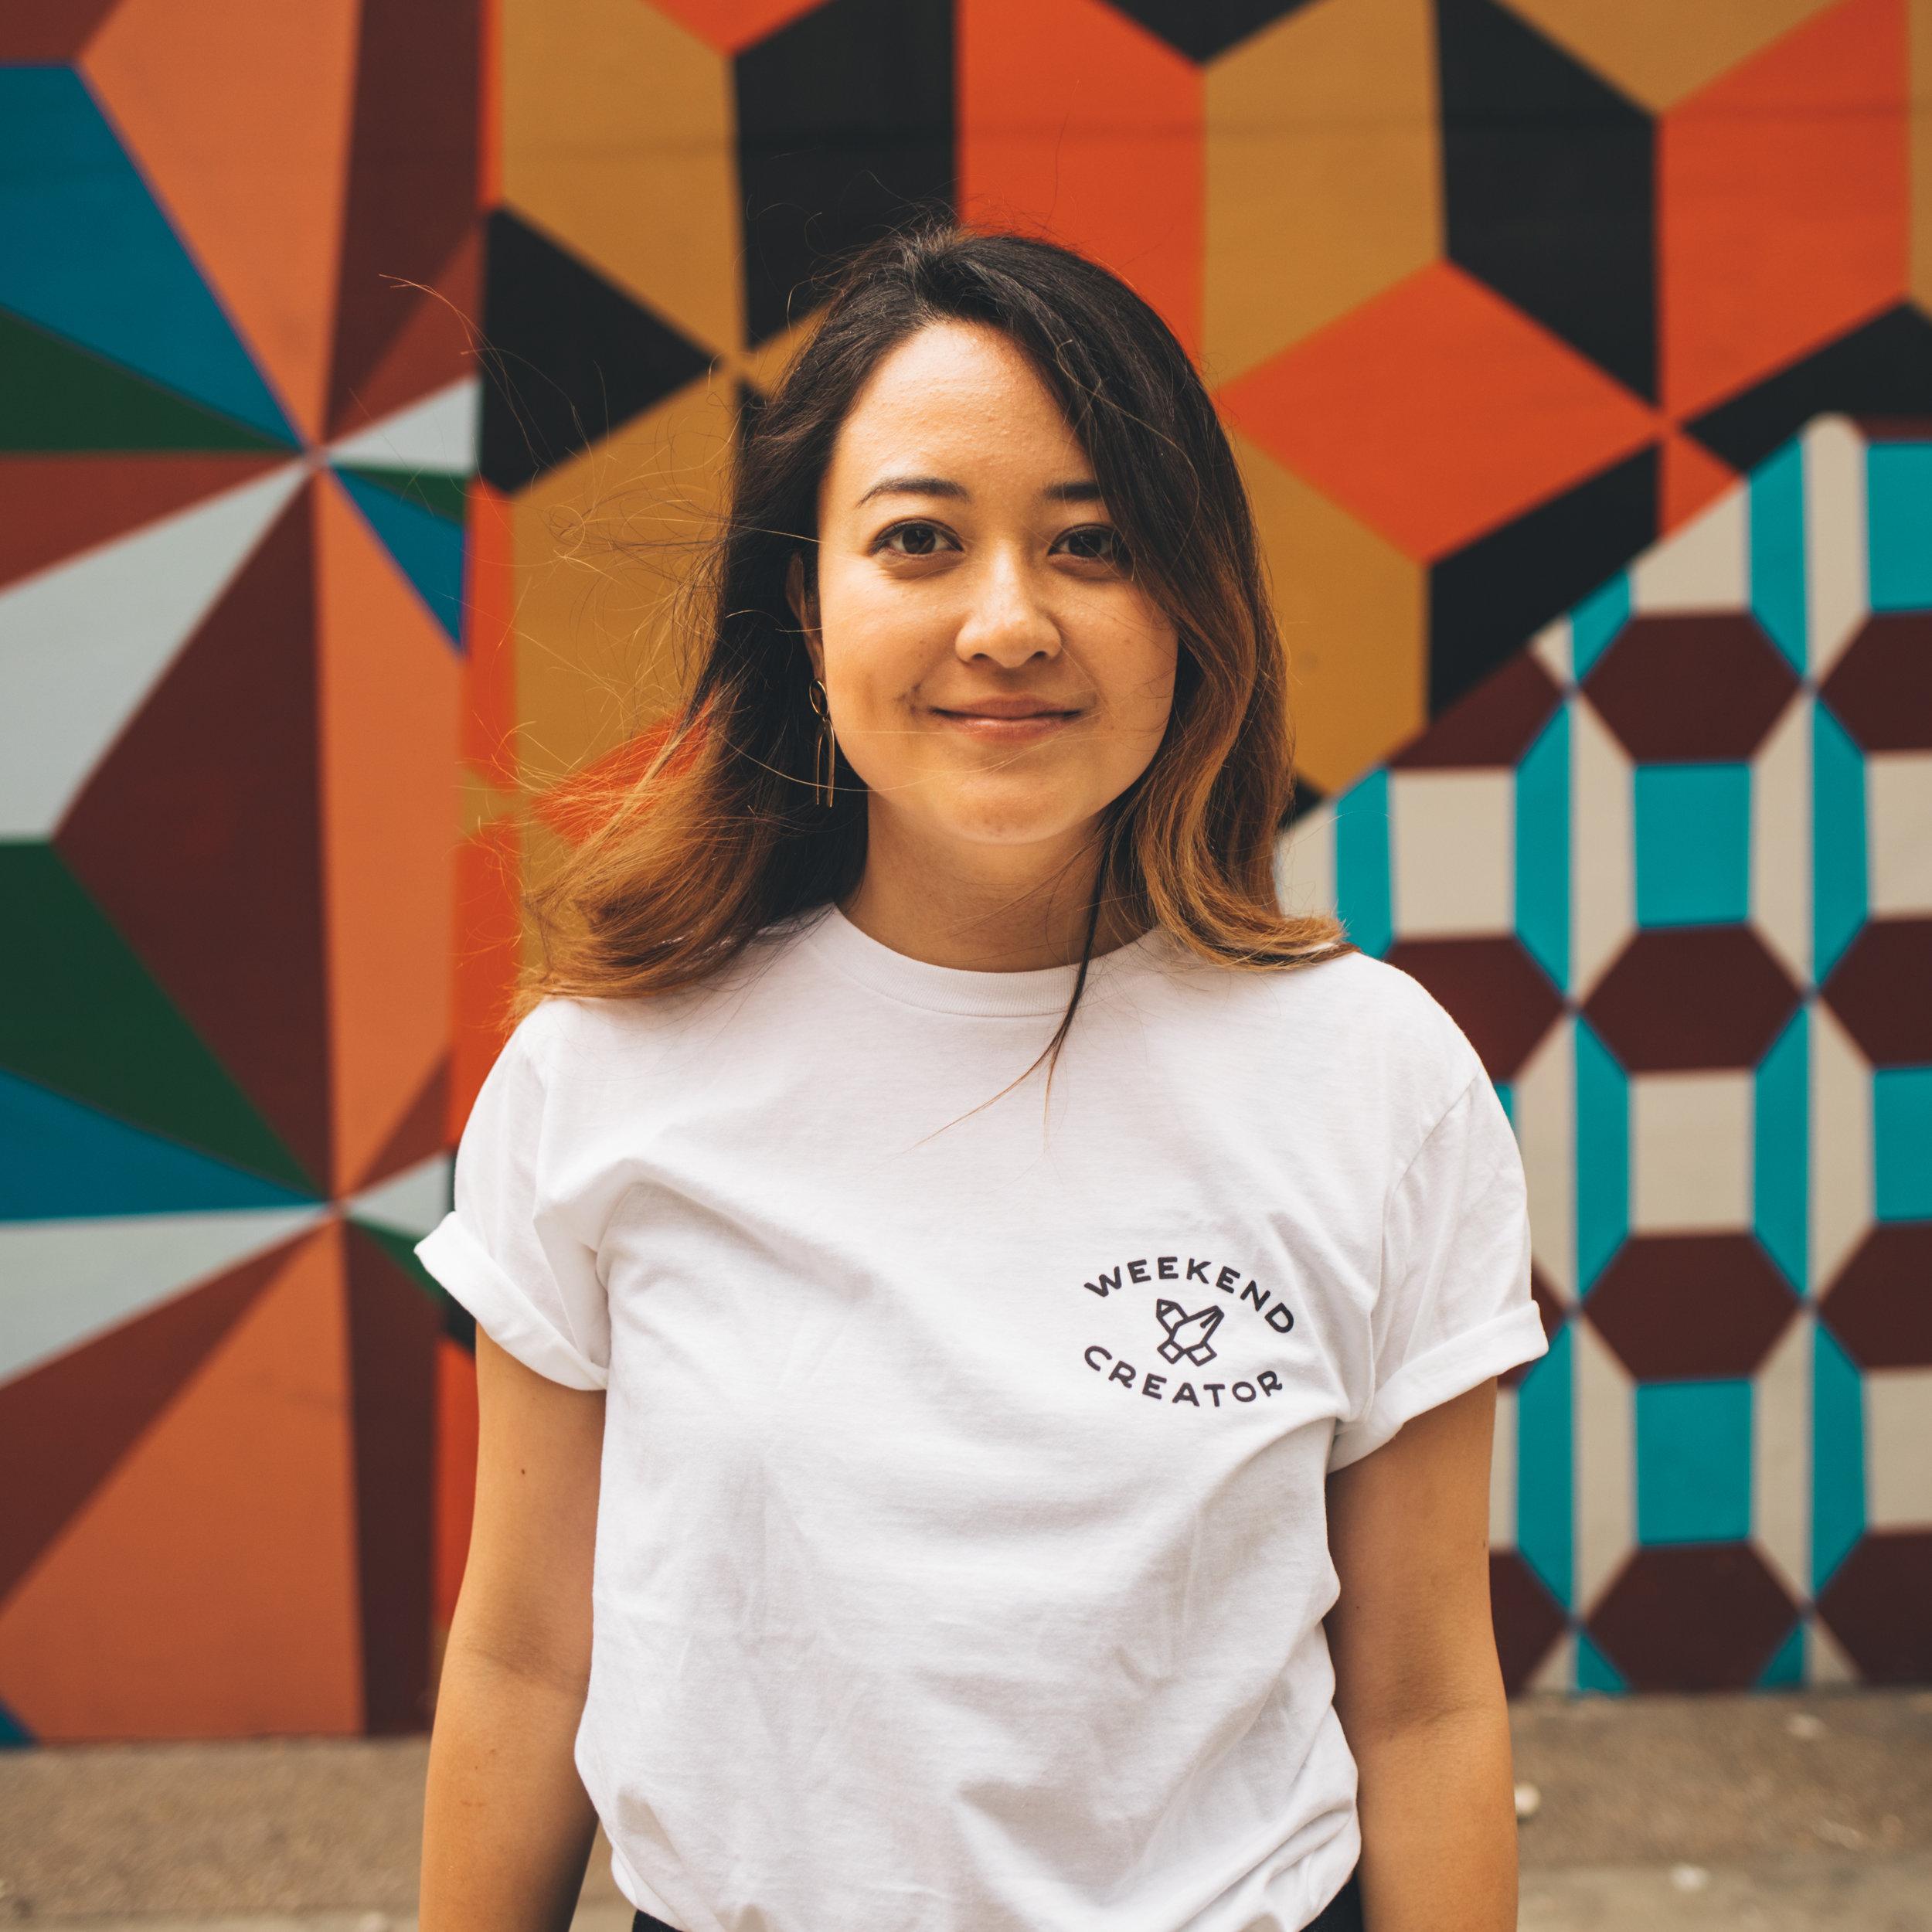 The Weekend Creator Tshirt in white. The first ever merch from Yuka Ohishi(@0oyukao0). #weekendcreator #週末クリエイター